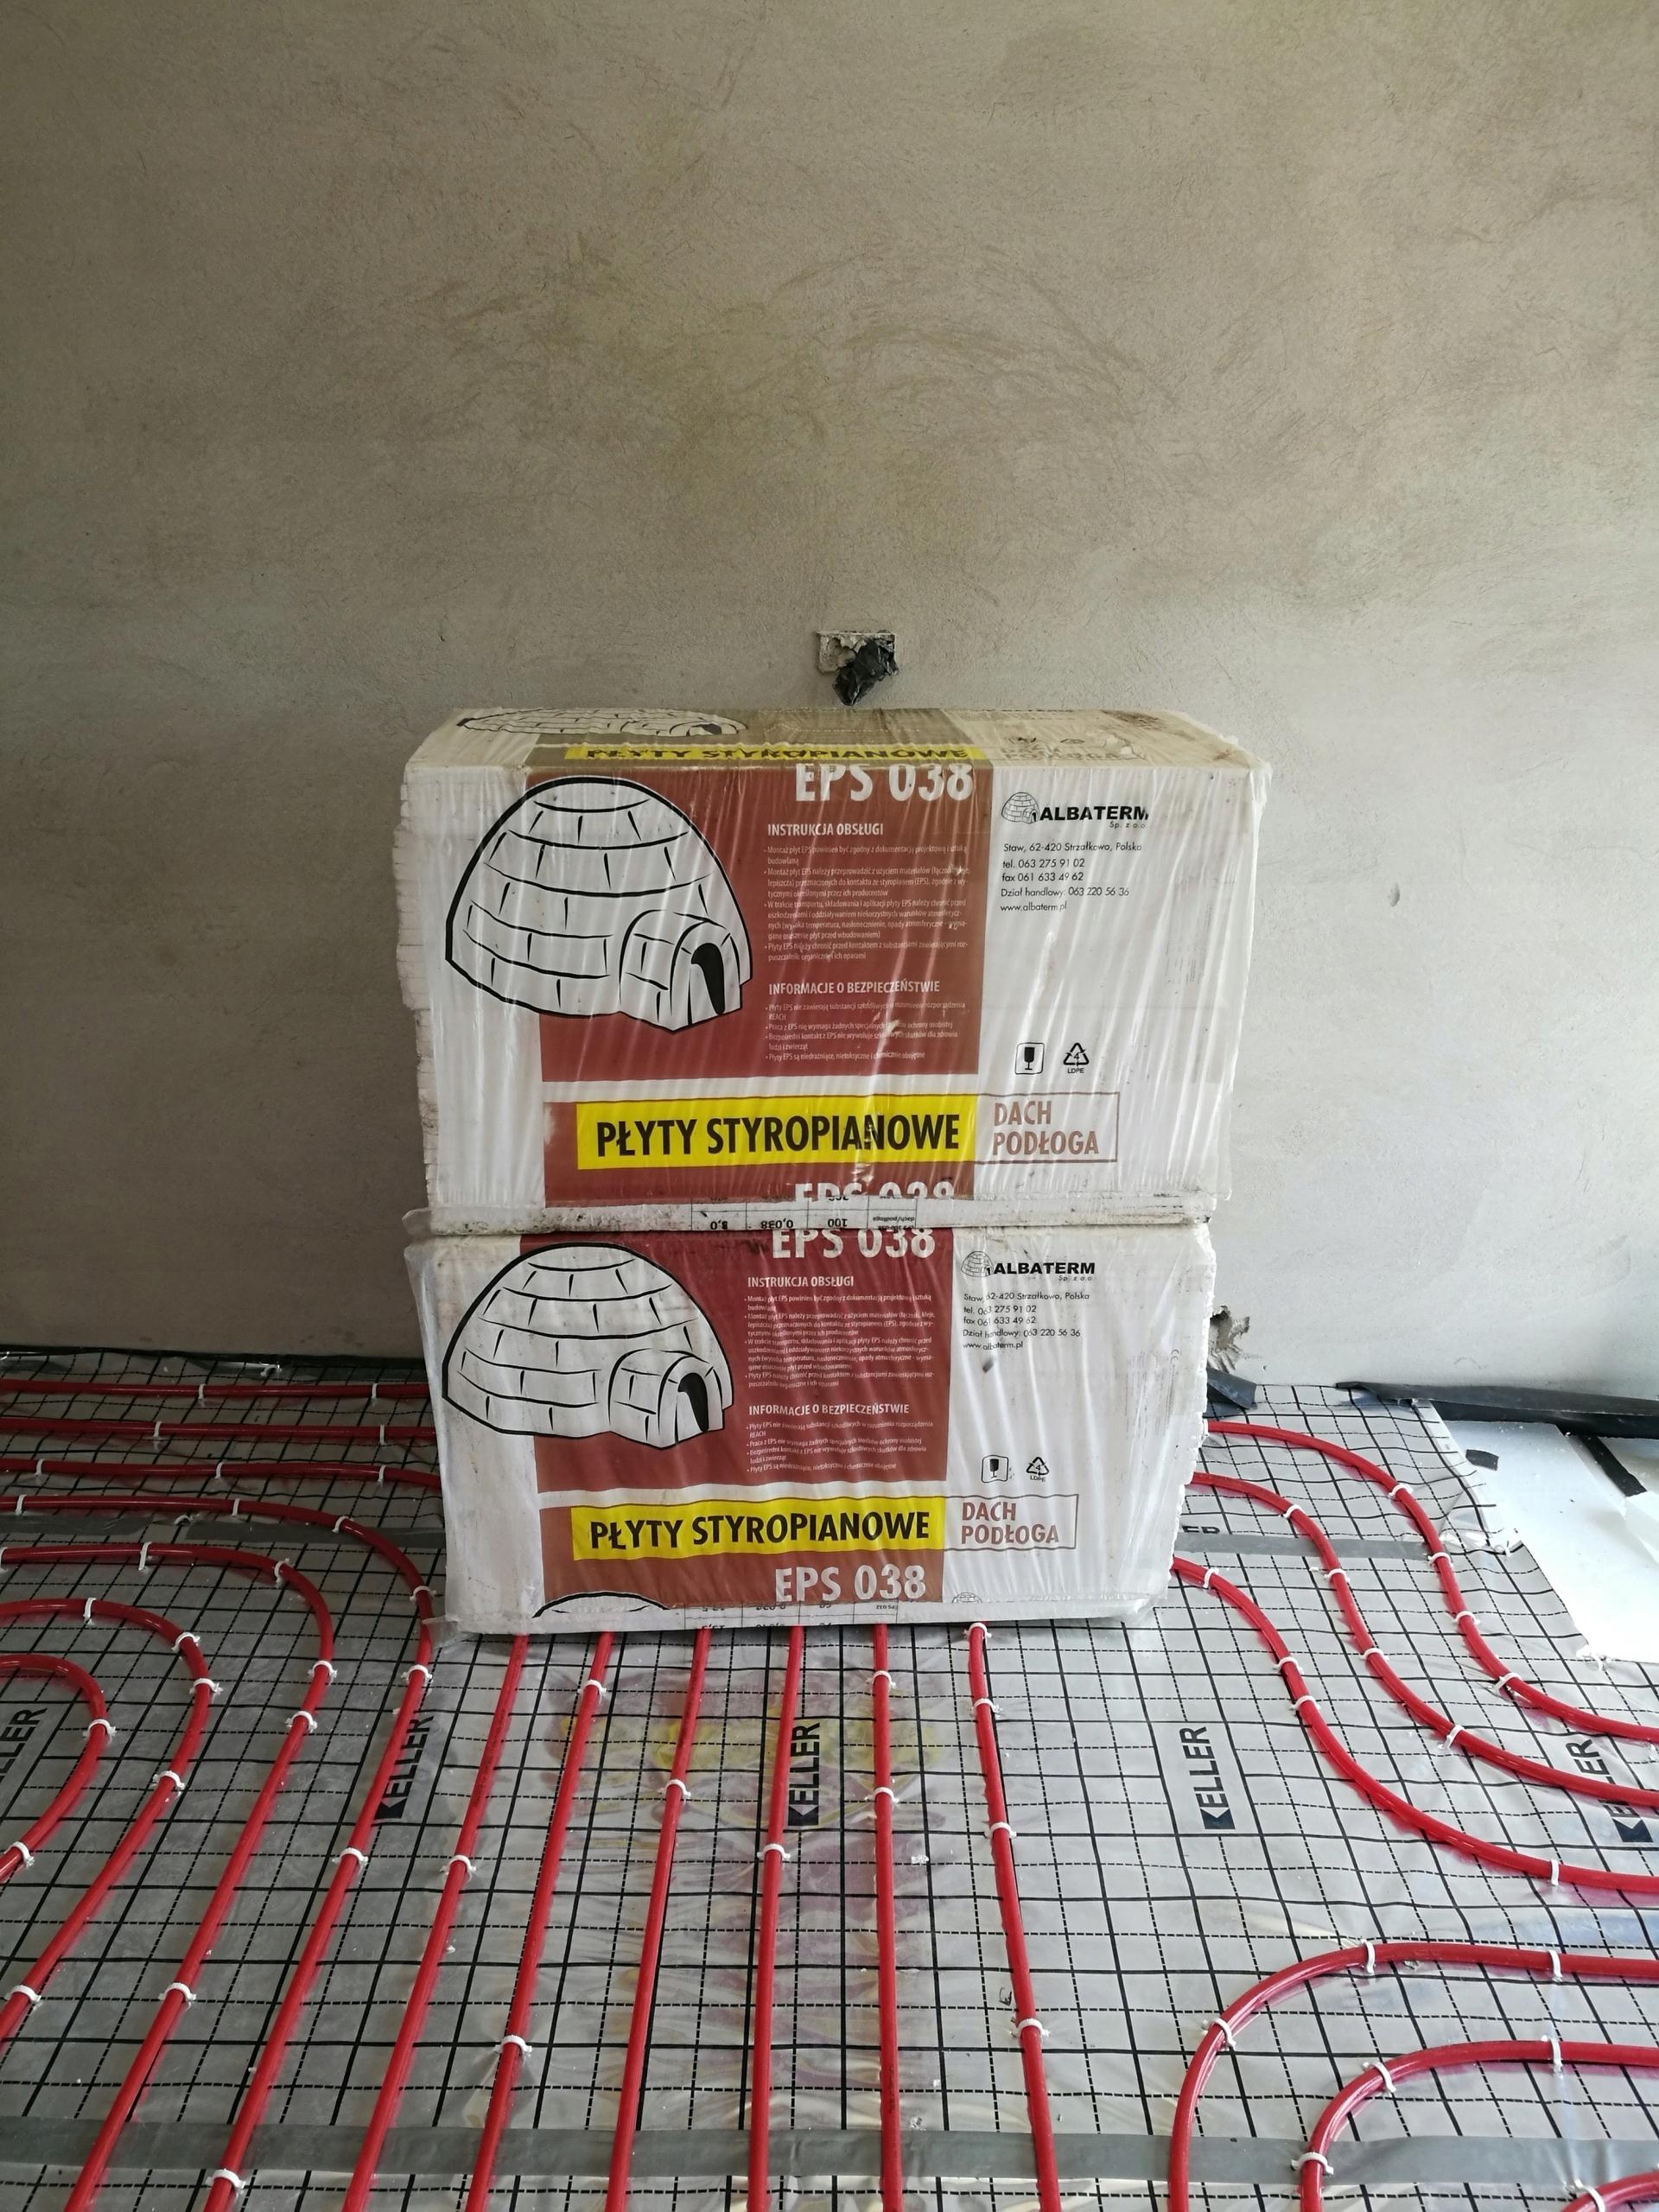 Styropian Dach Podloga Twardy Gr 2cm Eps 038 7468154253